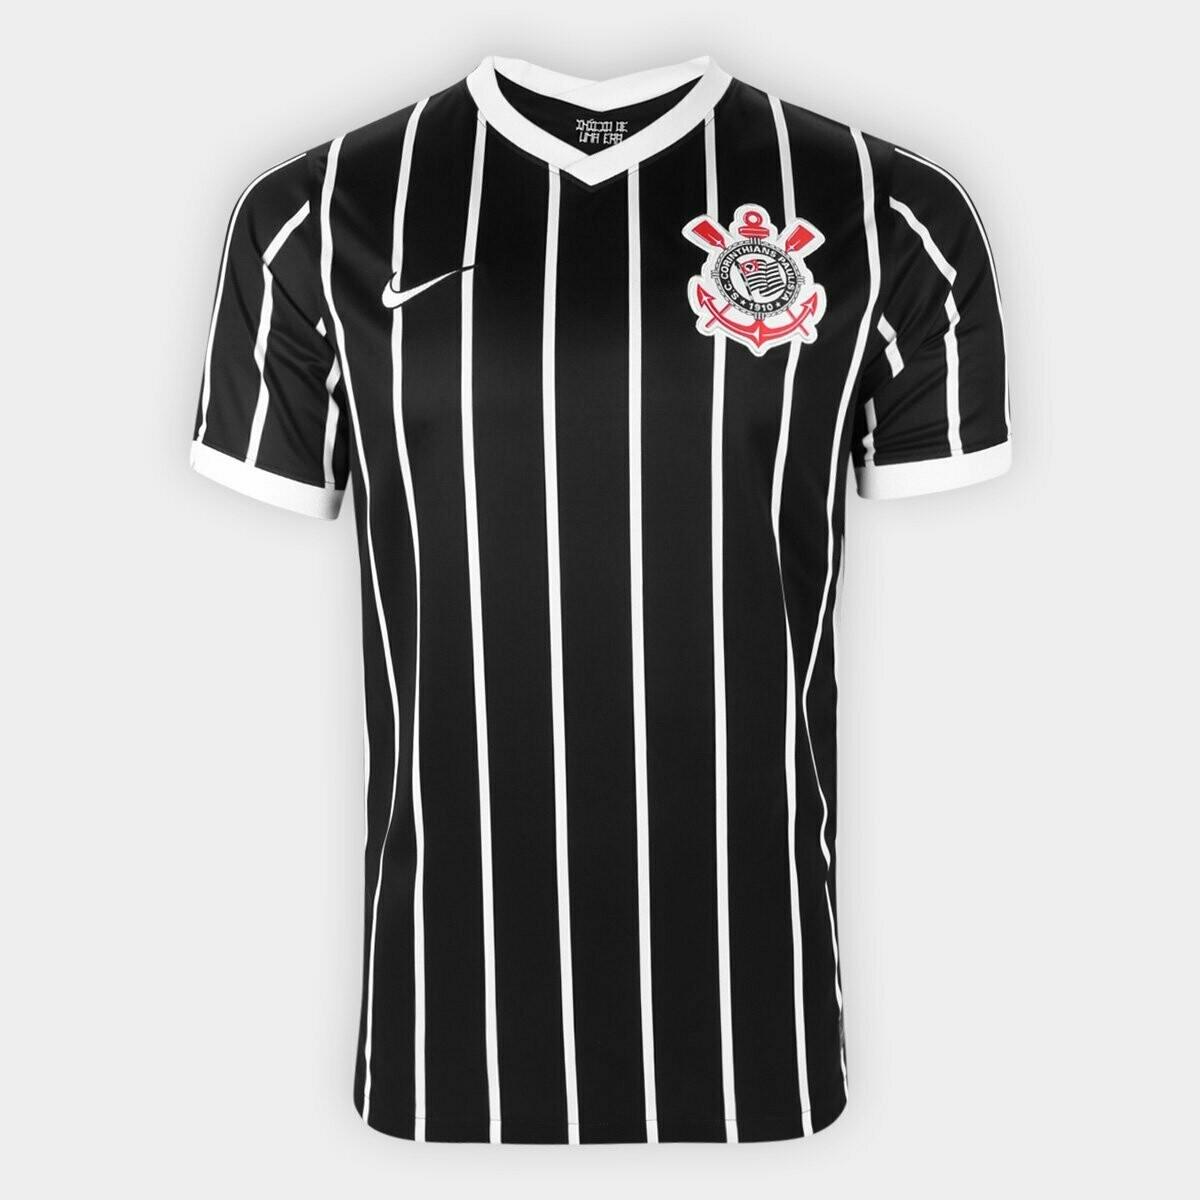 Camisa Corinthians II 20/21 Torcedor Nike Masculina - Preto e Branco